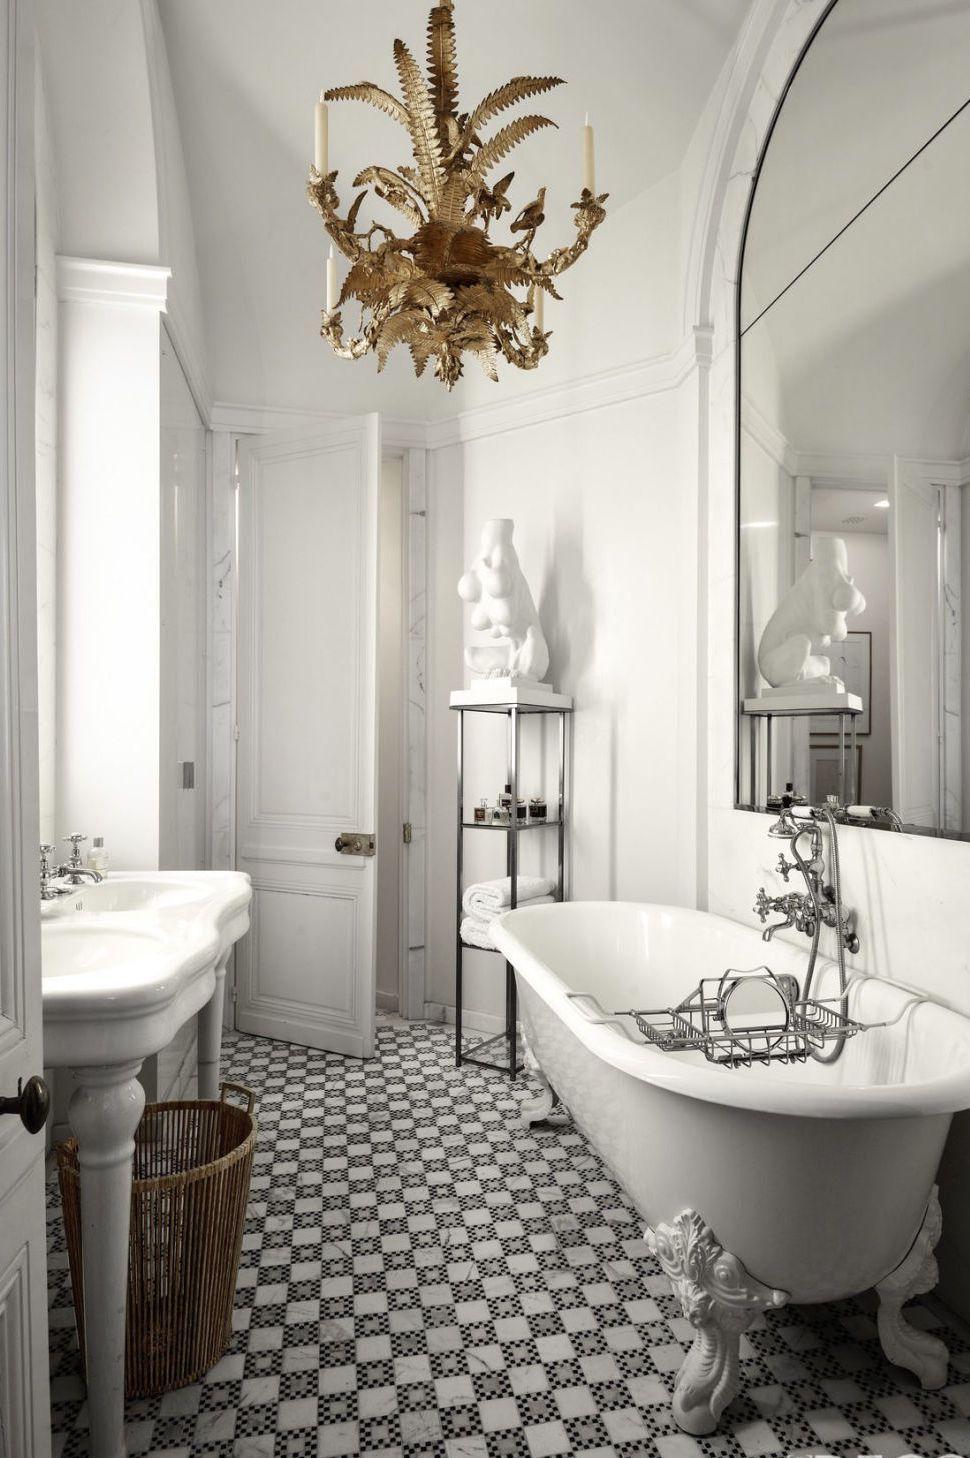 Modern bathrooms Tiles Modern Bathroom Ideas Elle Decor 25 Best Modern Bathrooms Luxe Bathroom Ideas With Modern Design